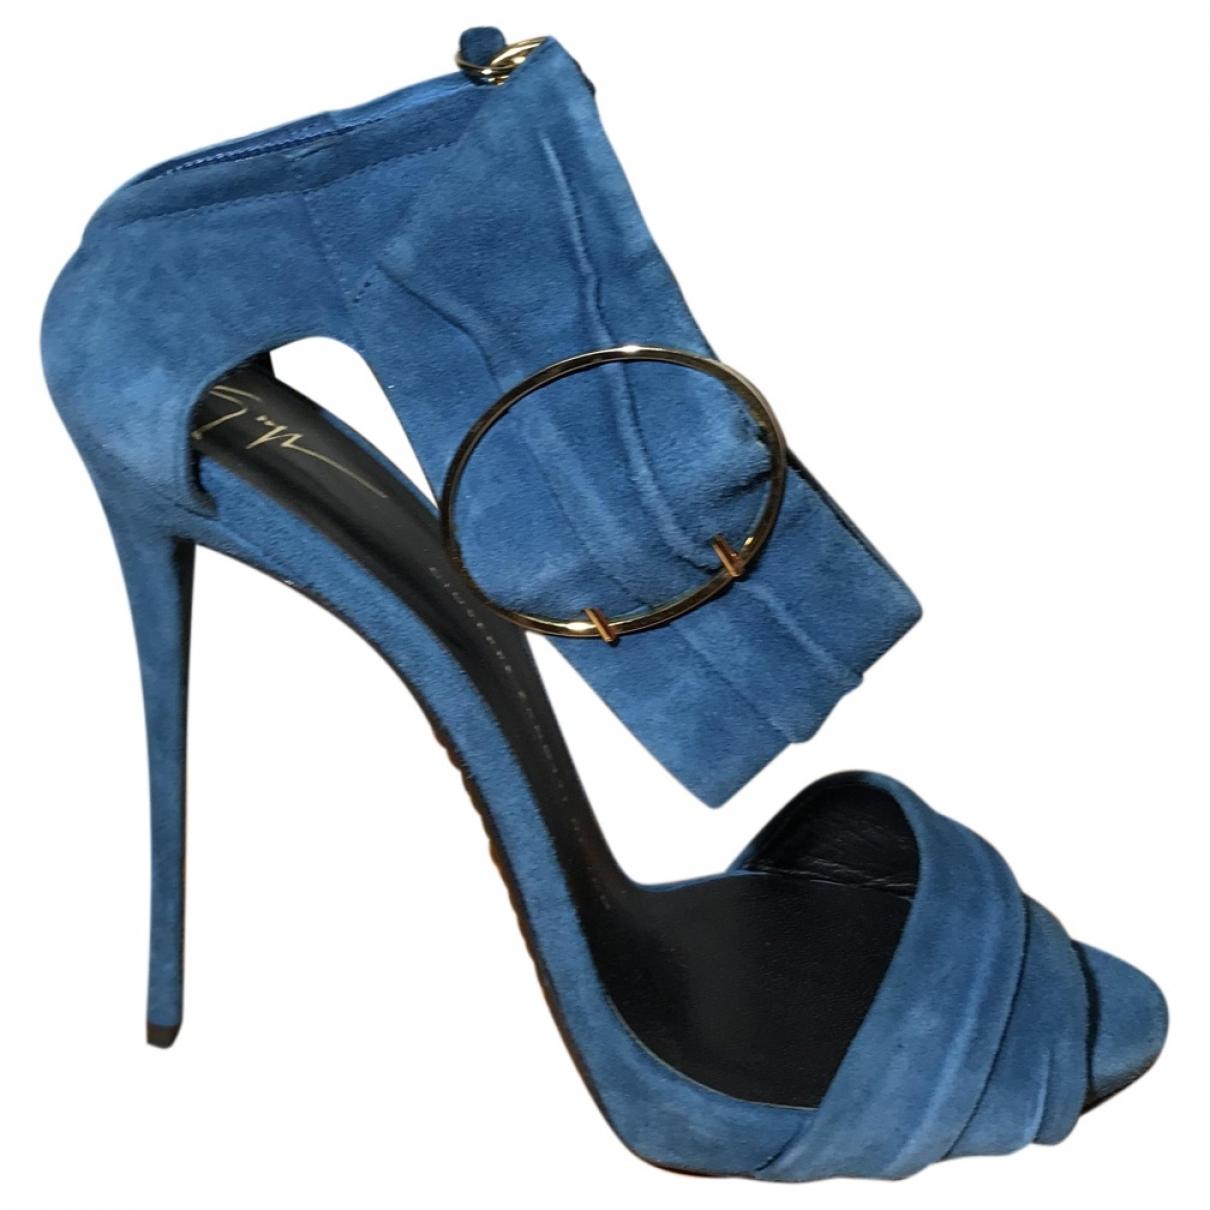 Giuseppe Zanotti - Sandales   pour femme en suede - bleu